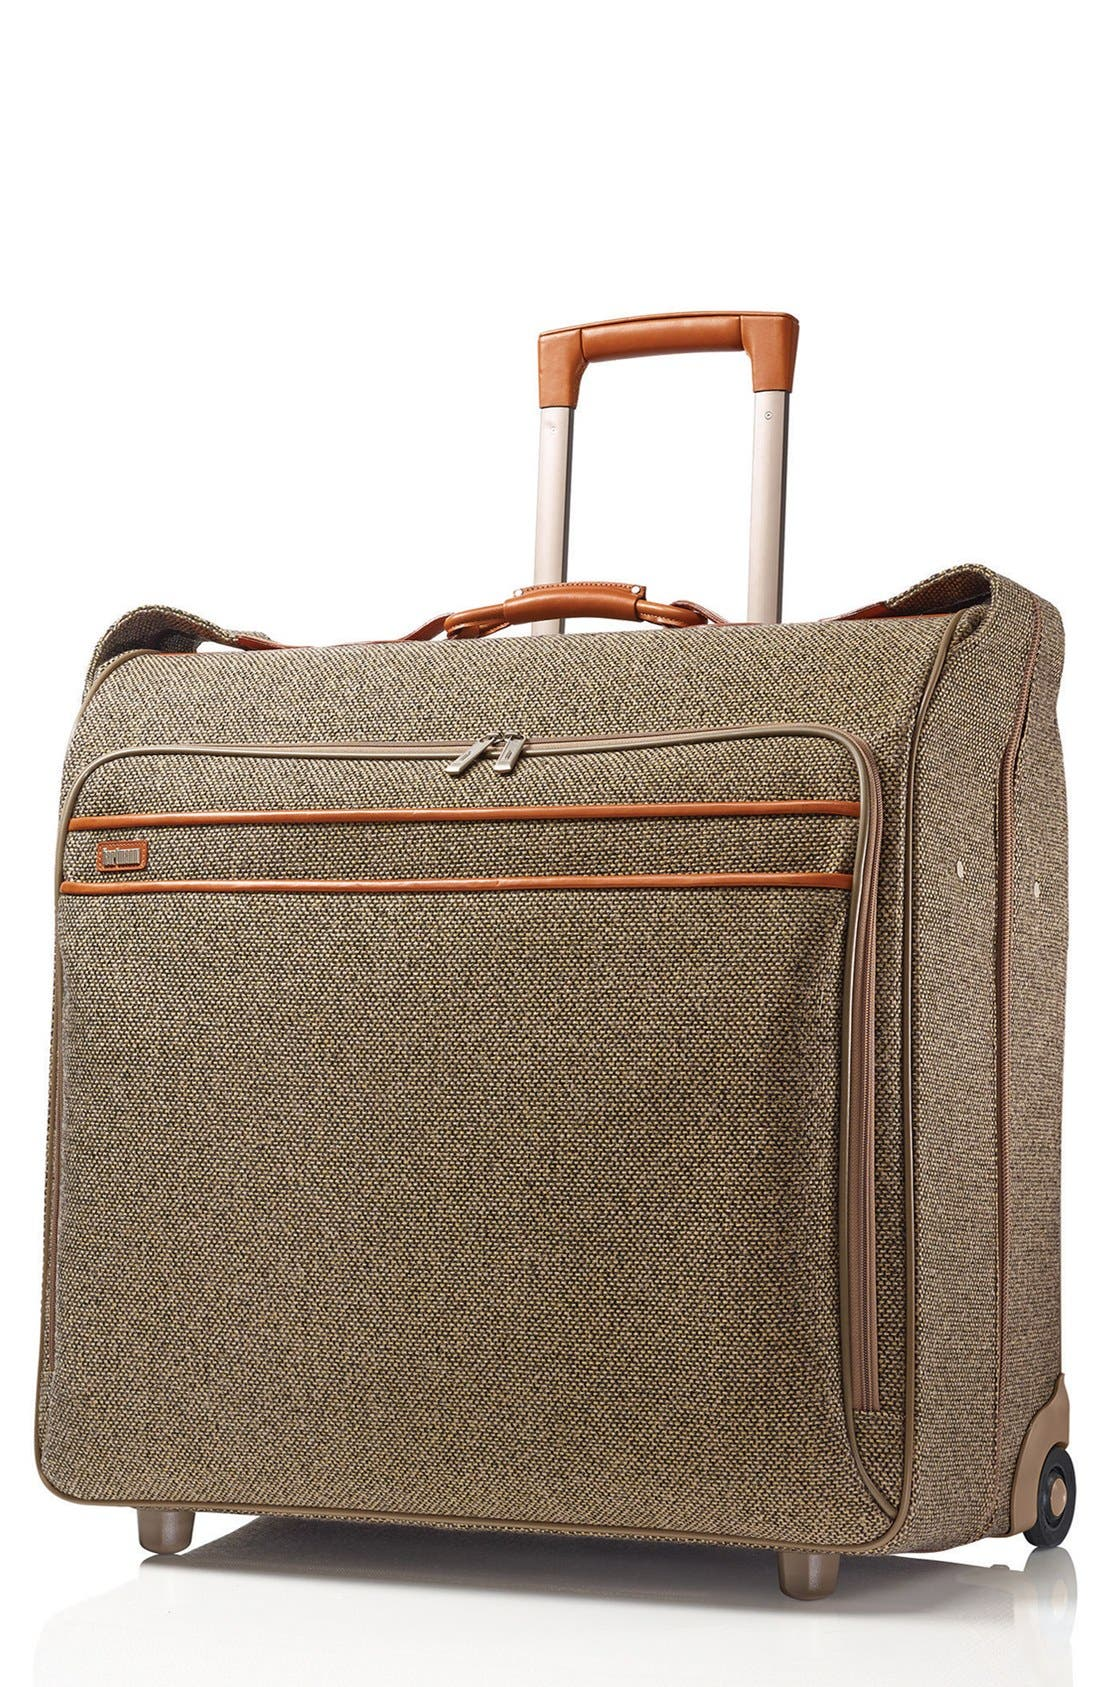 Alternate Image 1 Selected - Hartmann 'Tweed Belting' Wheeled Garment Bag